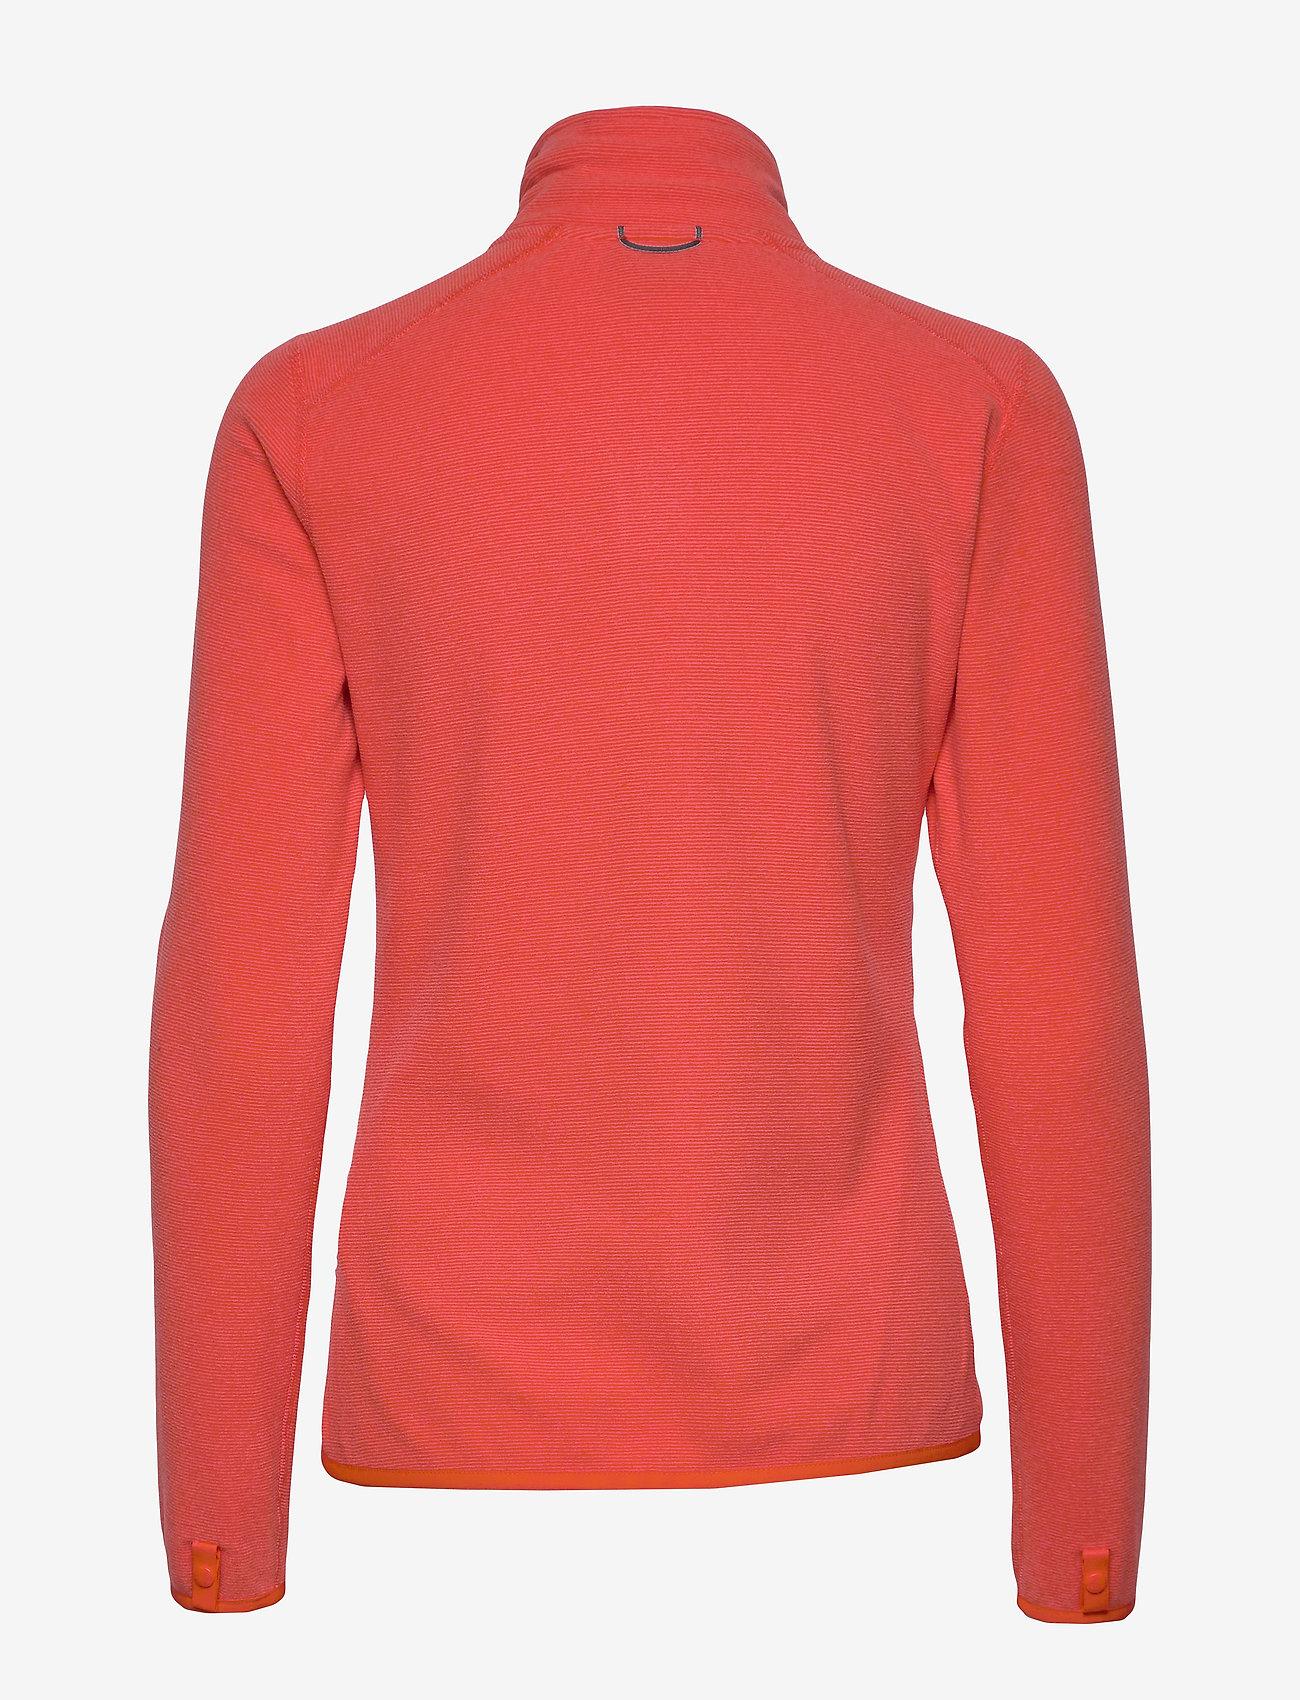 The North Face - W 100 GLACIER FULL ZIP - EU - fleece midlayer - cayenne red - 1